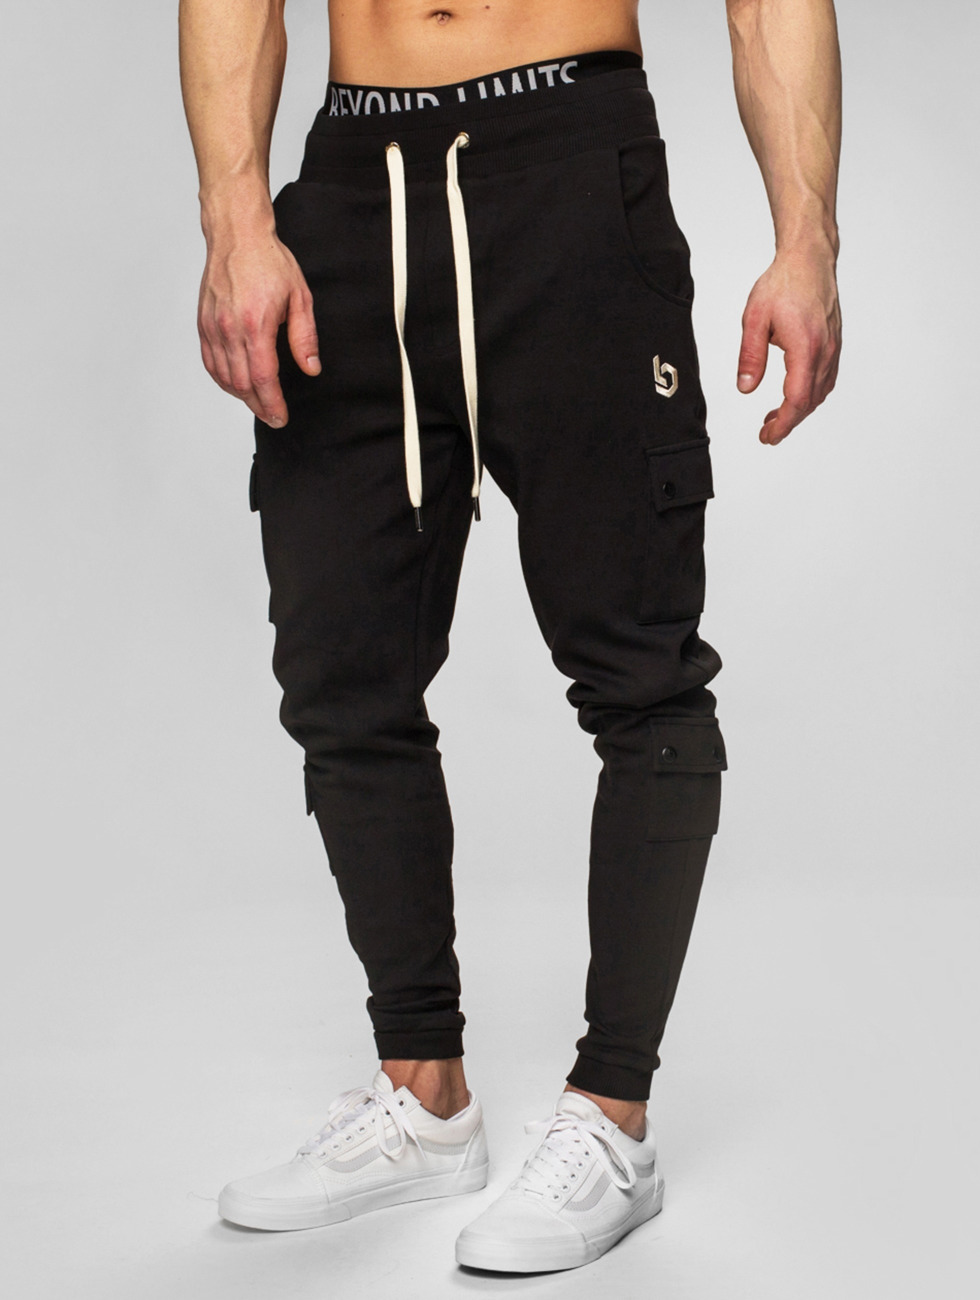 Beyond Limits Pantalone ginnico Cargo nero